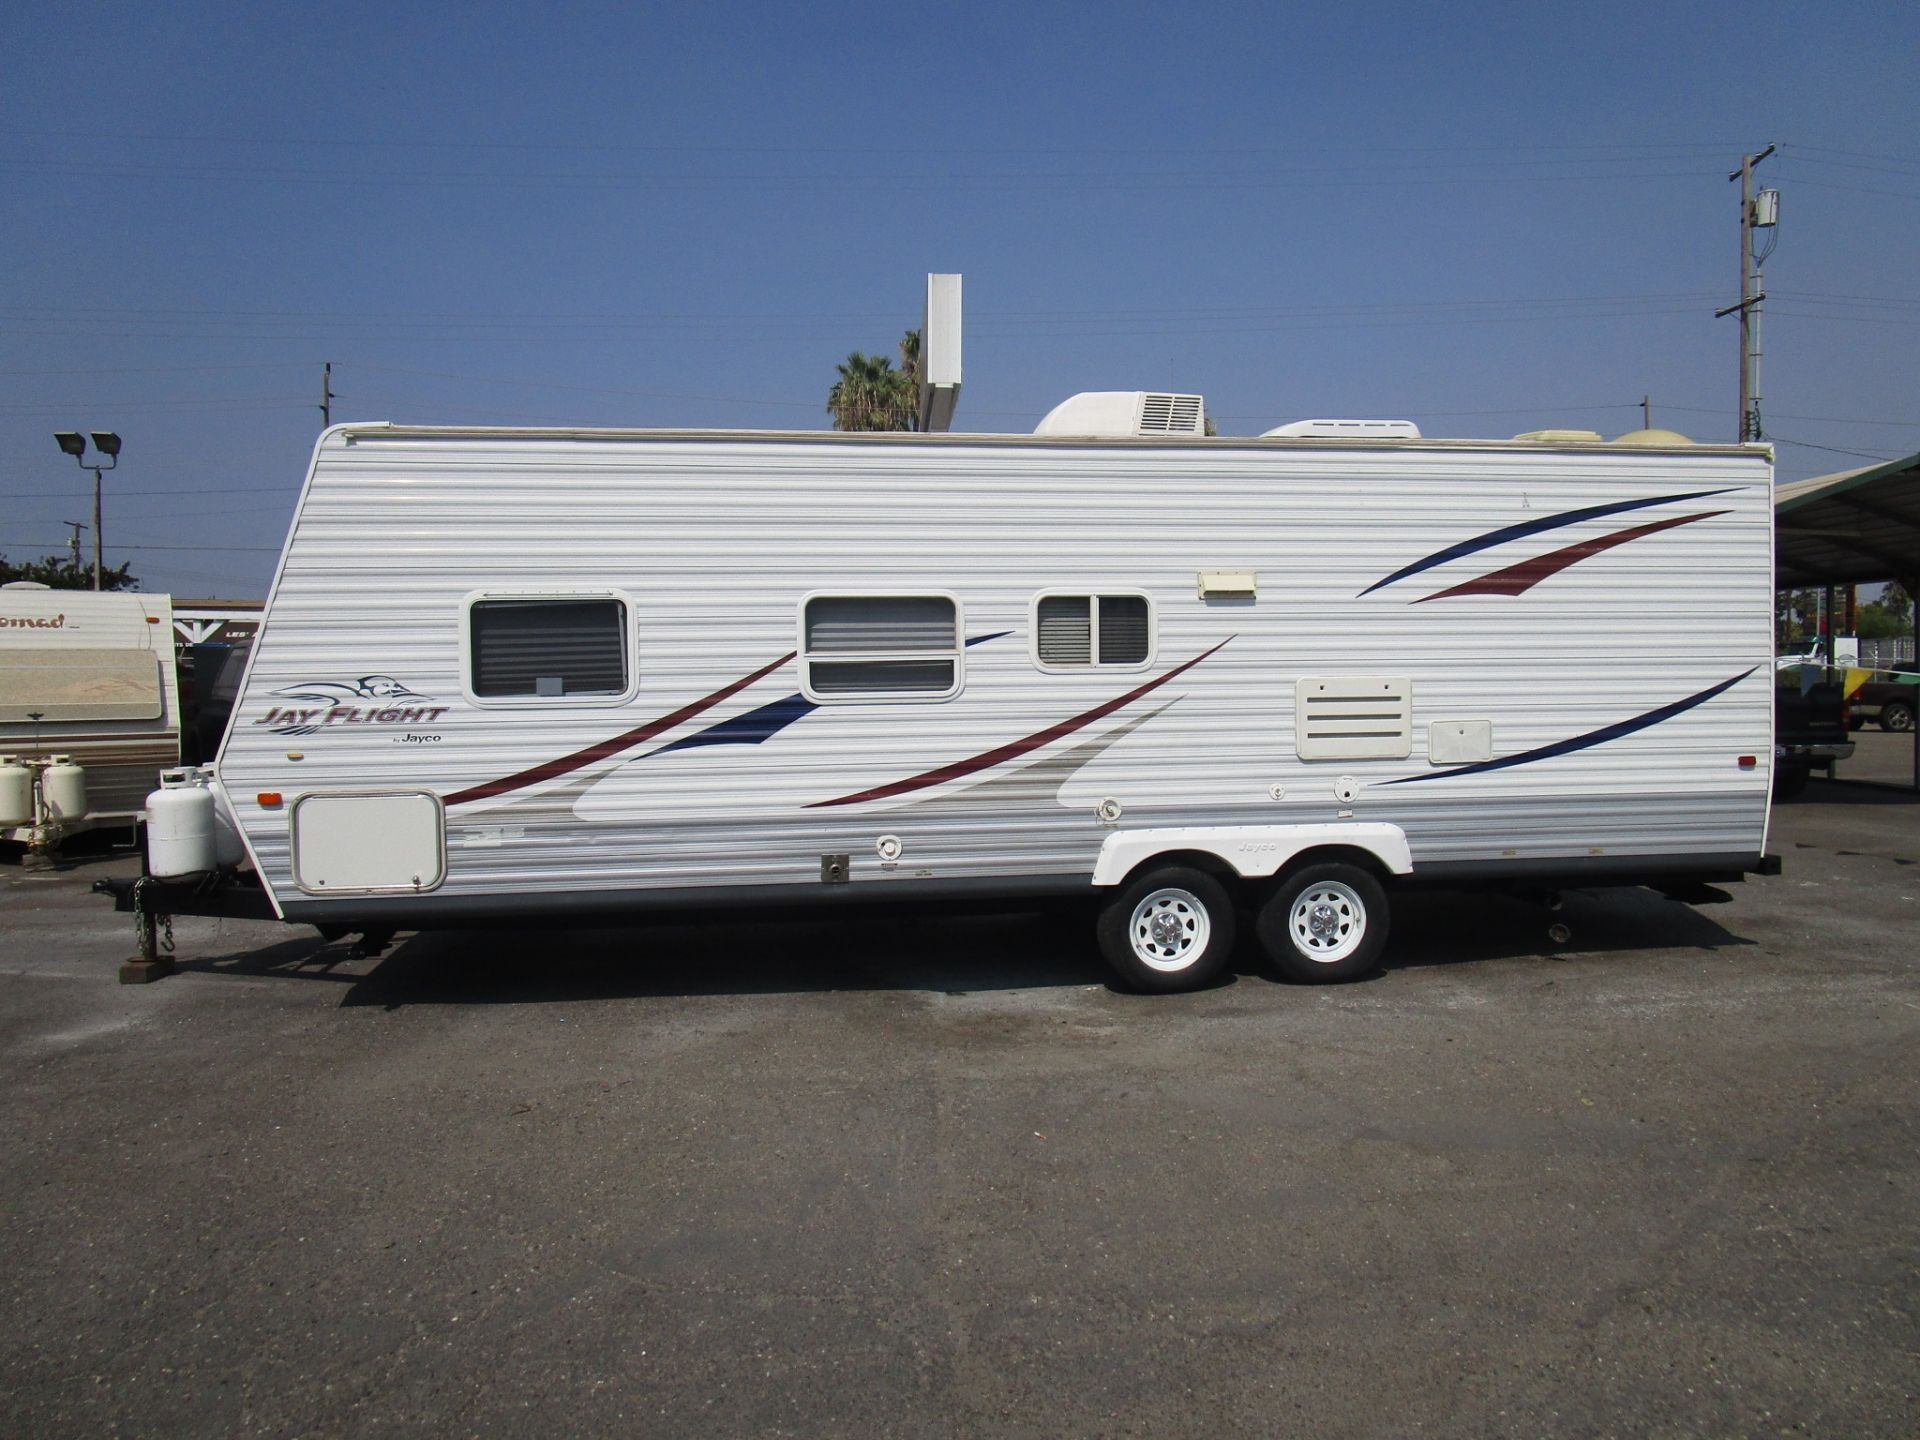 RV for sale: 2007 Jayco Jayflight Bunkhouse Travel Trailer ...